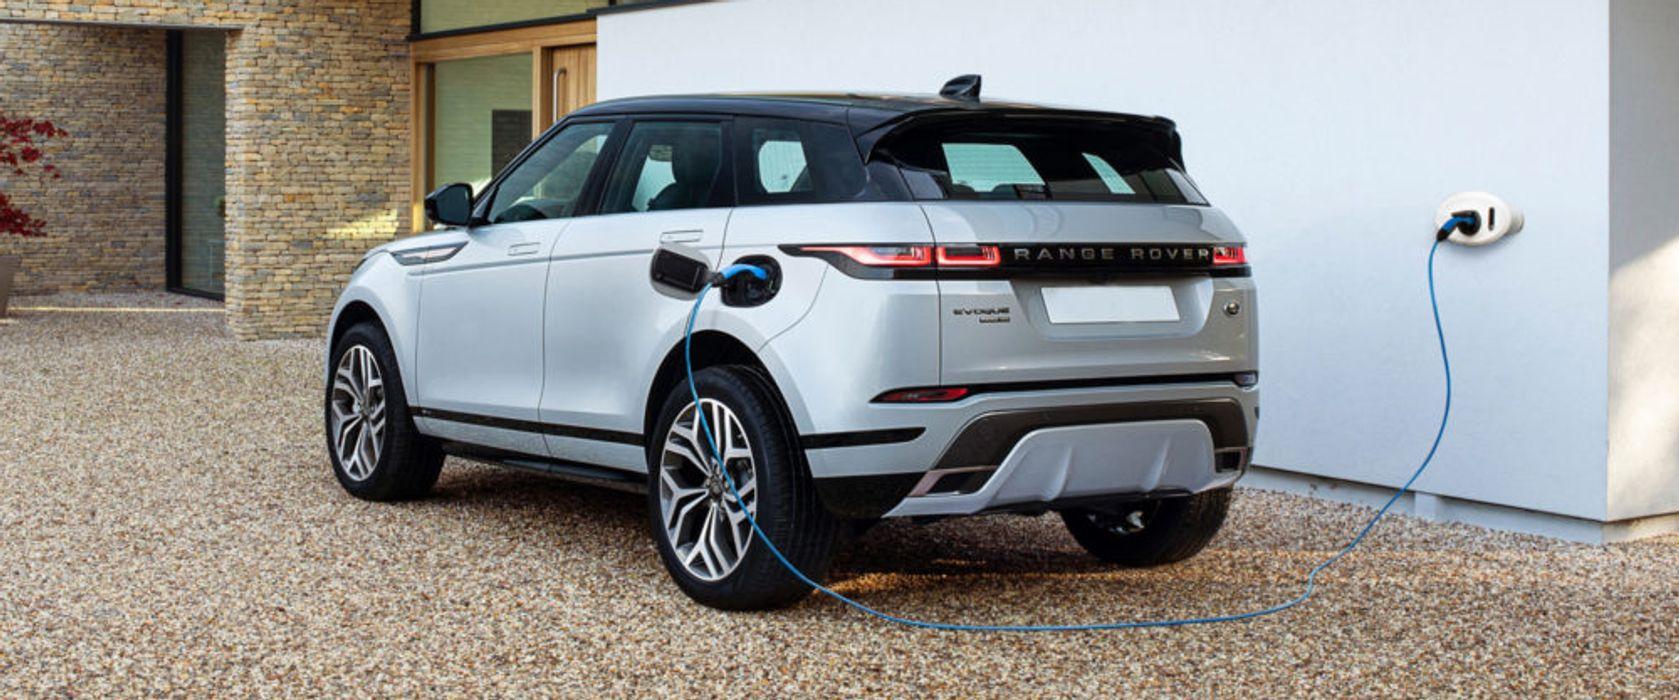 Nye Range Rover Evoque PHEV